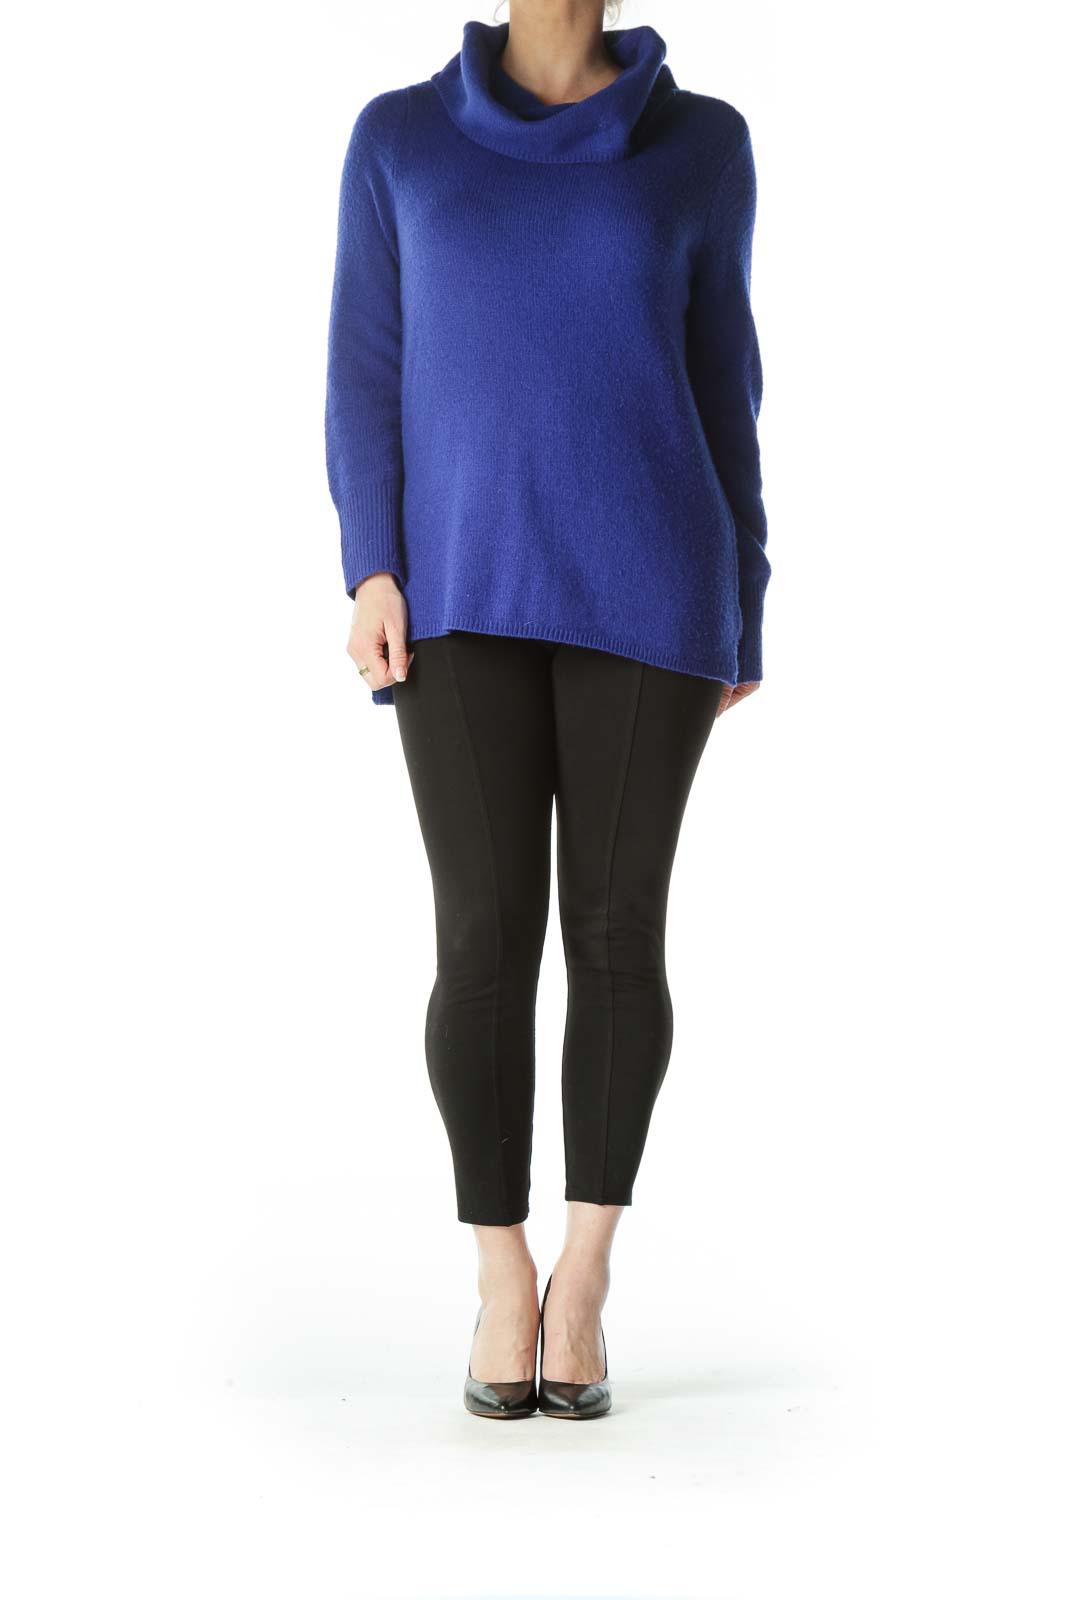 Blue Knit Turtle Neck Long Sweater